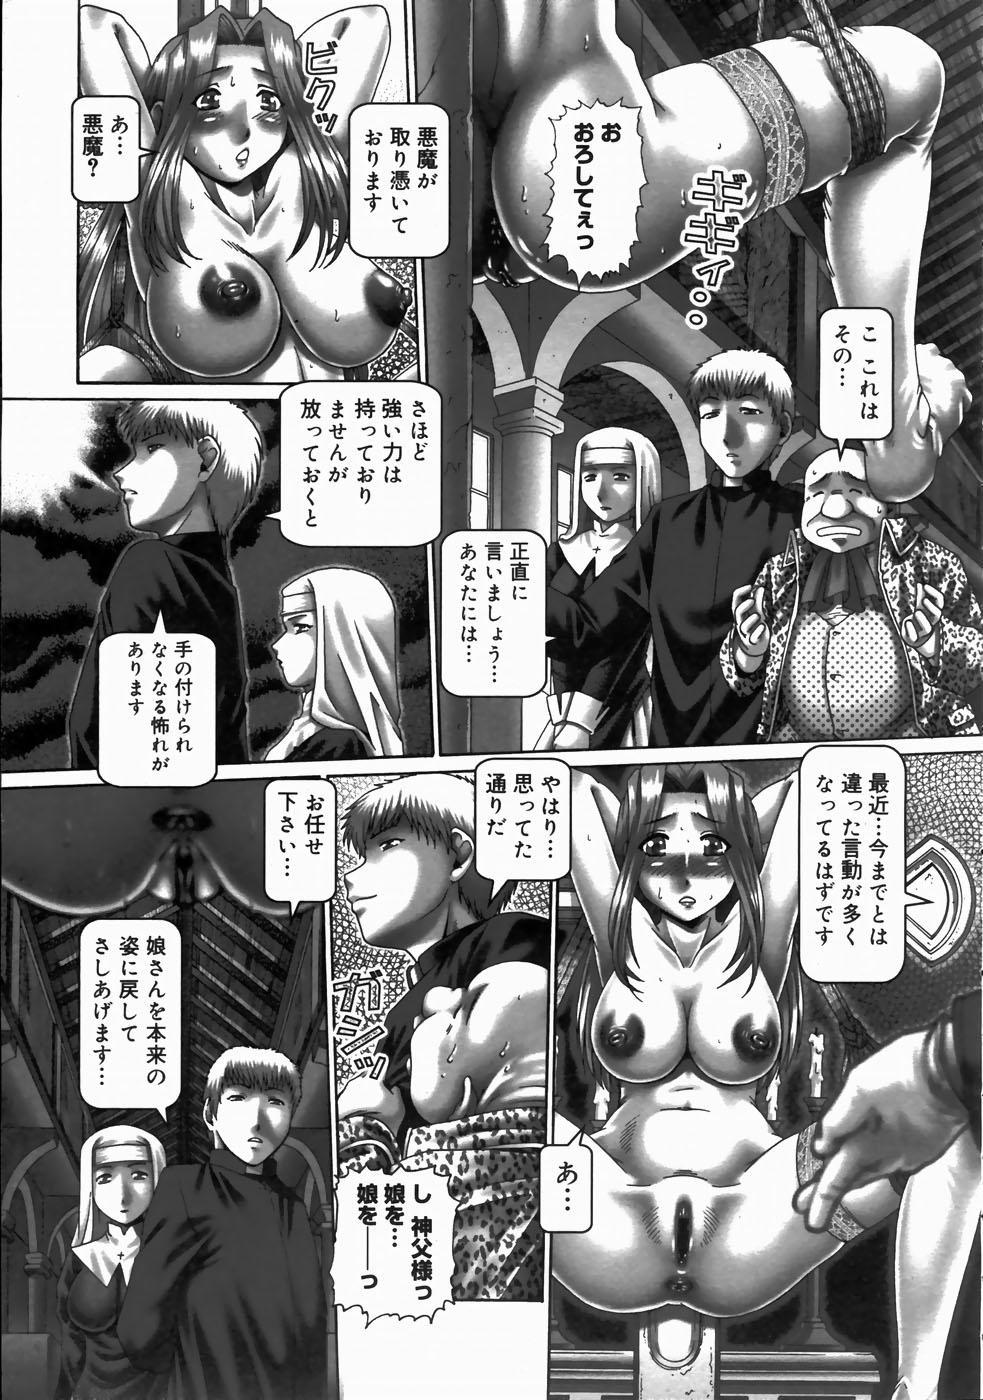 COMIC Megastore H 2003-07 40